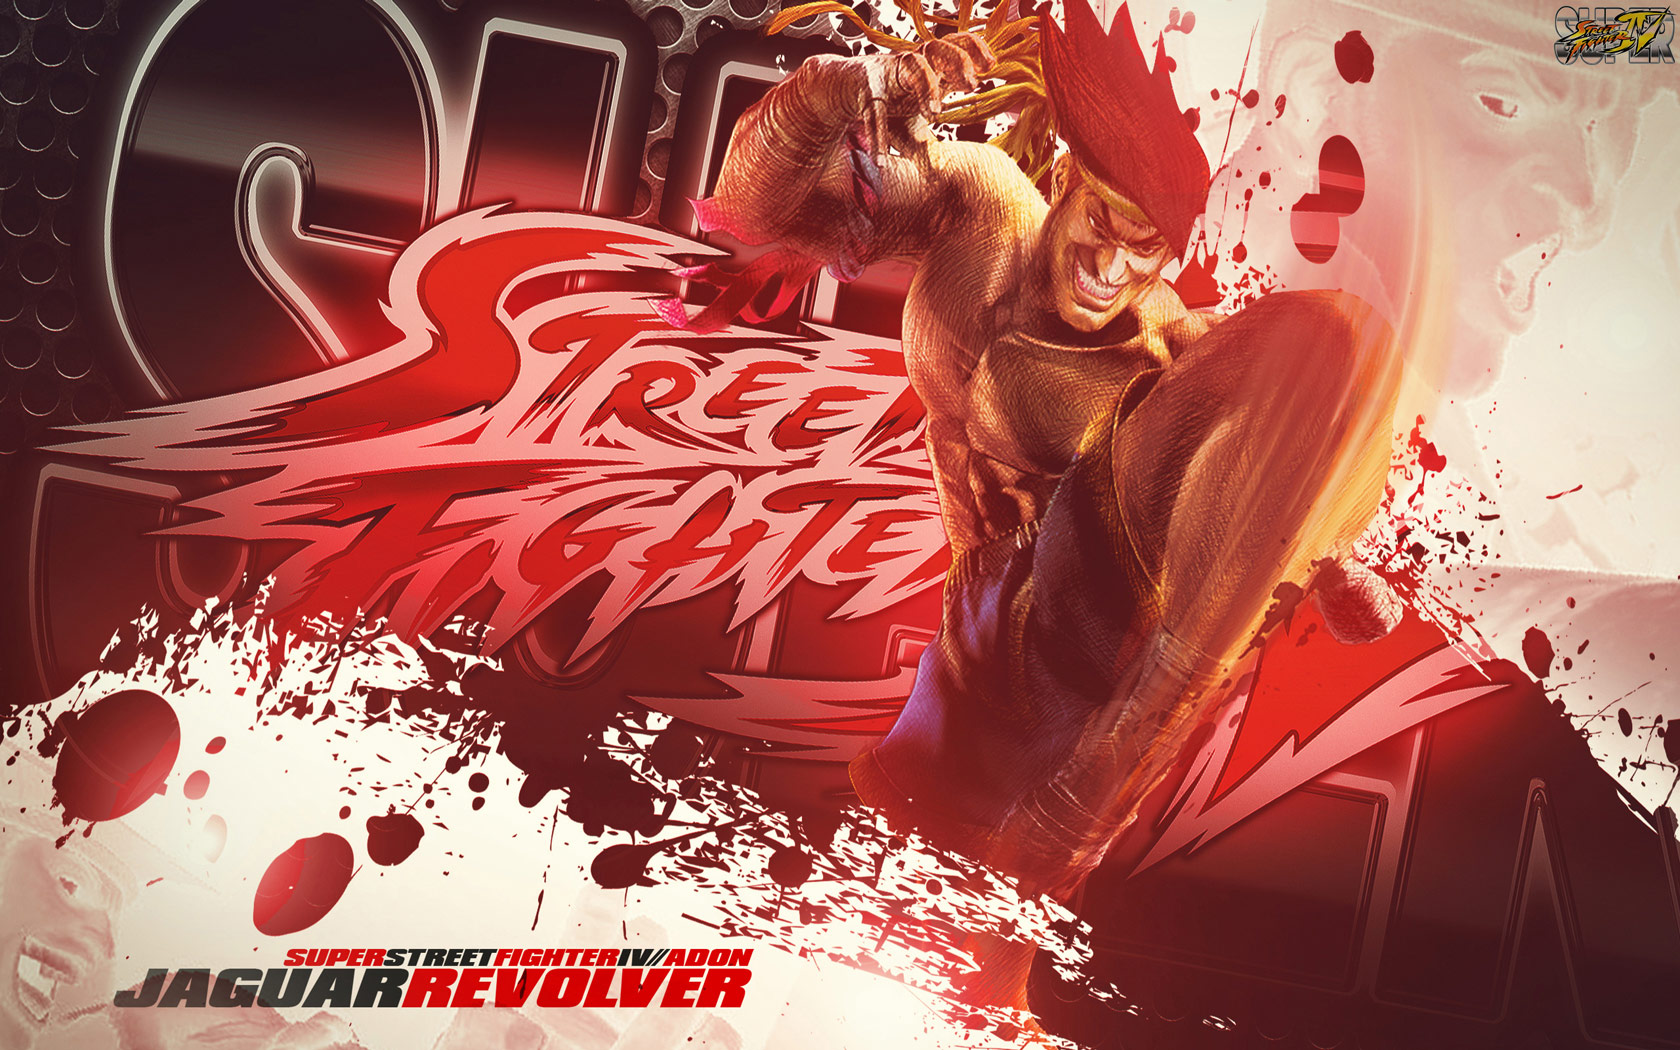 Adon Super Street Fighter 4 wallpaper by BossLogic